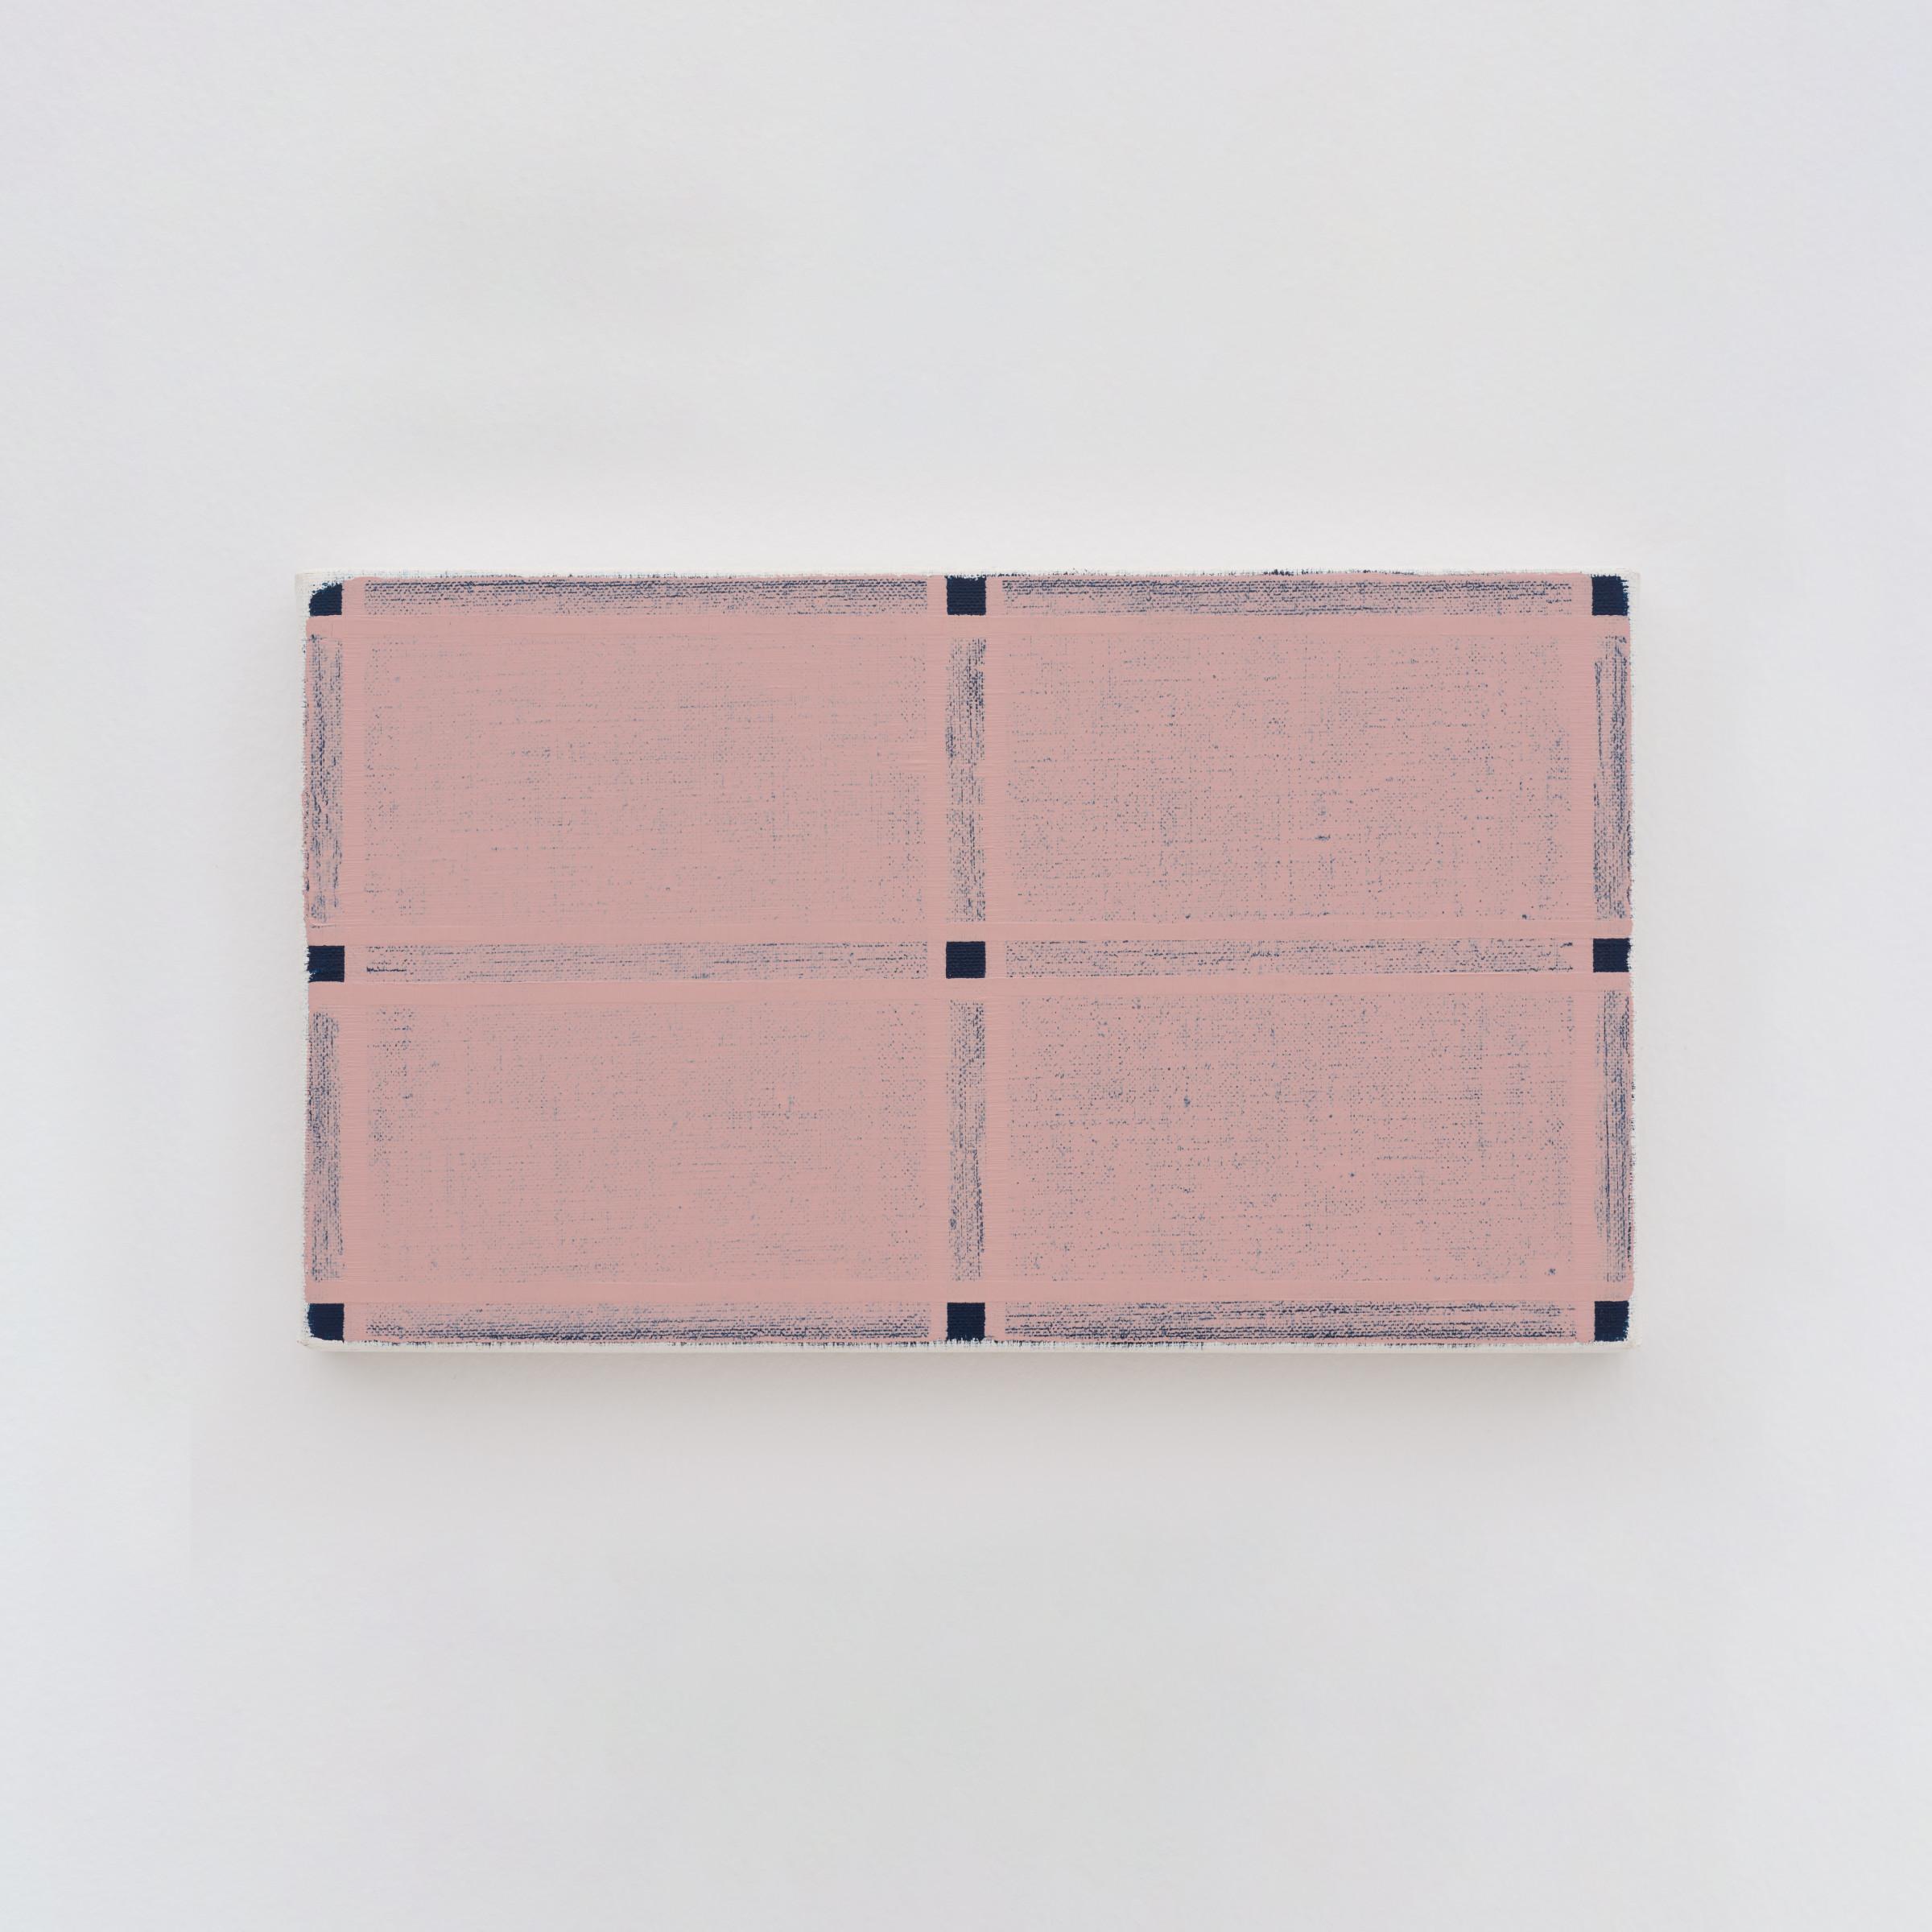 "<span class=""link fancybox-details-link""><a href=""/exhibitions/172/works/artworks16582/"">View Detail Page</a></span><div class=""artist""><strong>Yui Yaegashi</strong></div><div class=""title""><em>white-gray-black No.7</em>, 2019</div><div class=""medium"">oil on canvas</div><div class=""dimensions"">14,3 x 24,5 cm</div>"